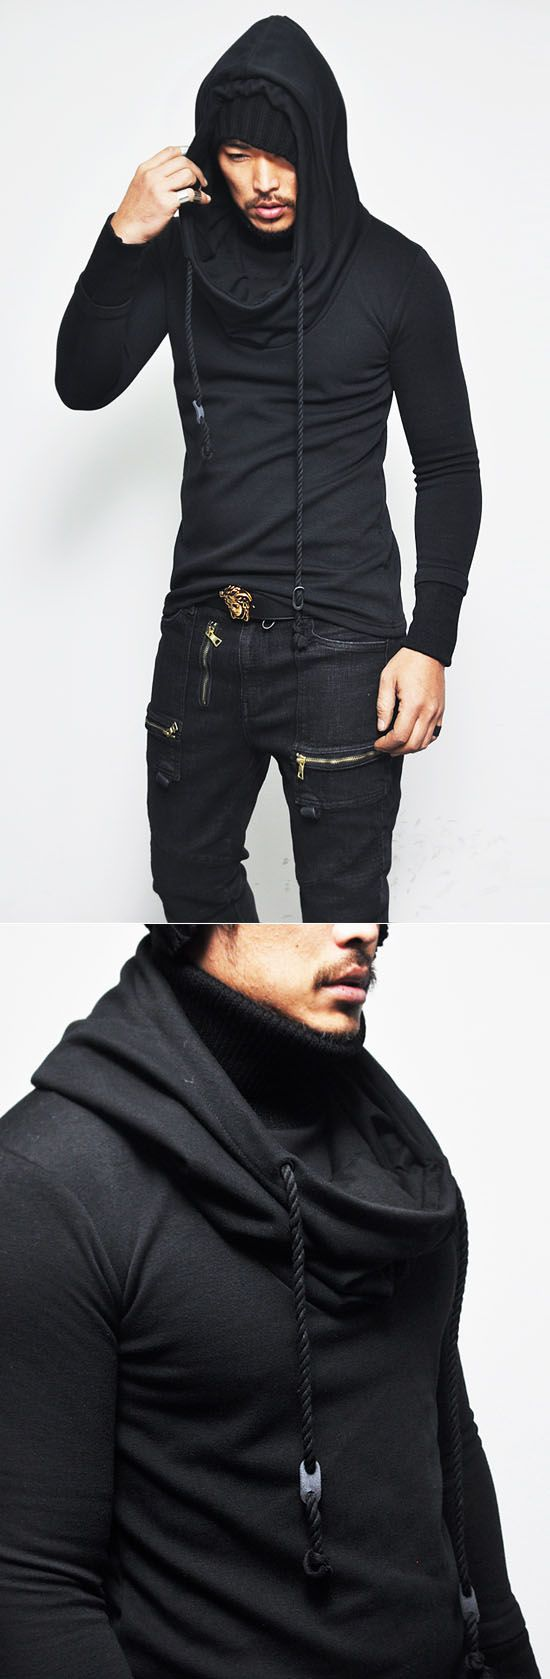 Built-in Turtle Fleece Hood Jersey-Hoodie - Mens Fashion Clothing For An Attractive Guy Look repin & like please. Check out Noelito Flow music. #Noel. Thanks https://www.twitter.com/noelitoflow http://www.instagram.com/rockstarking